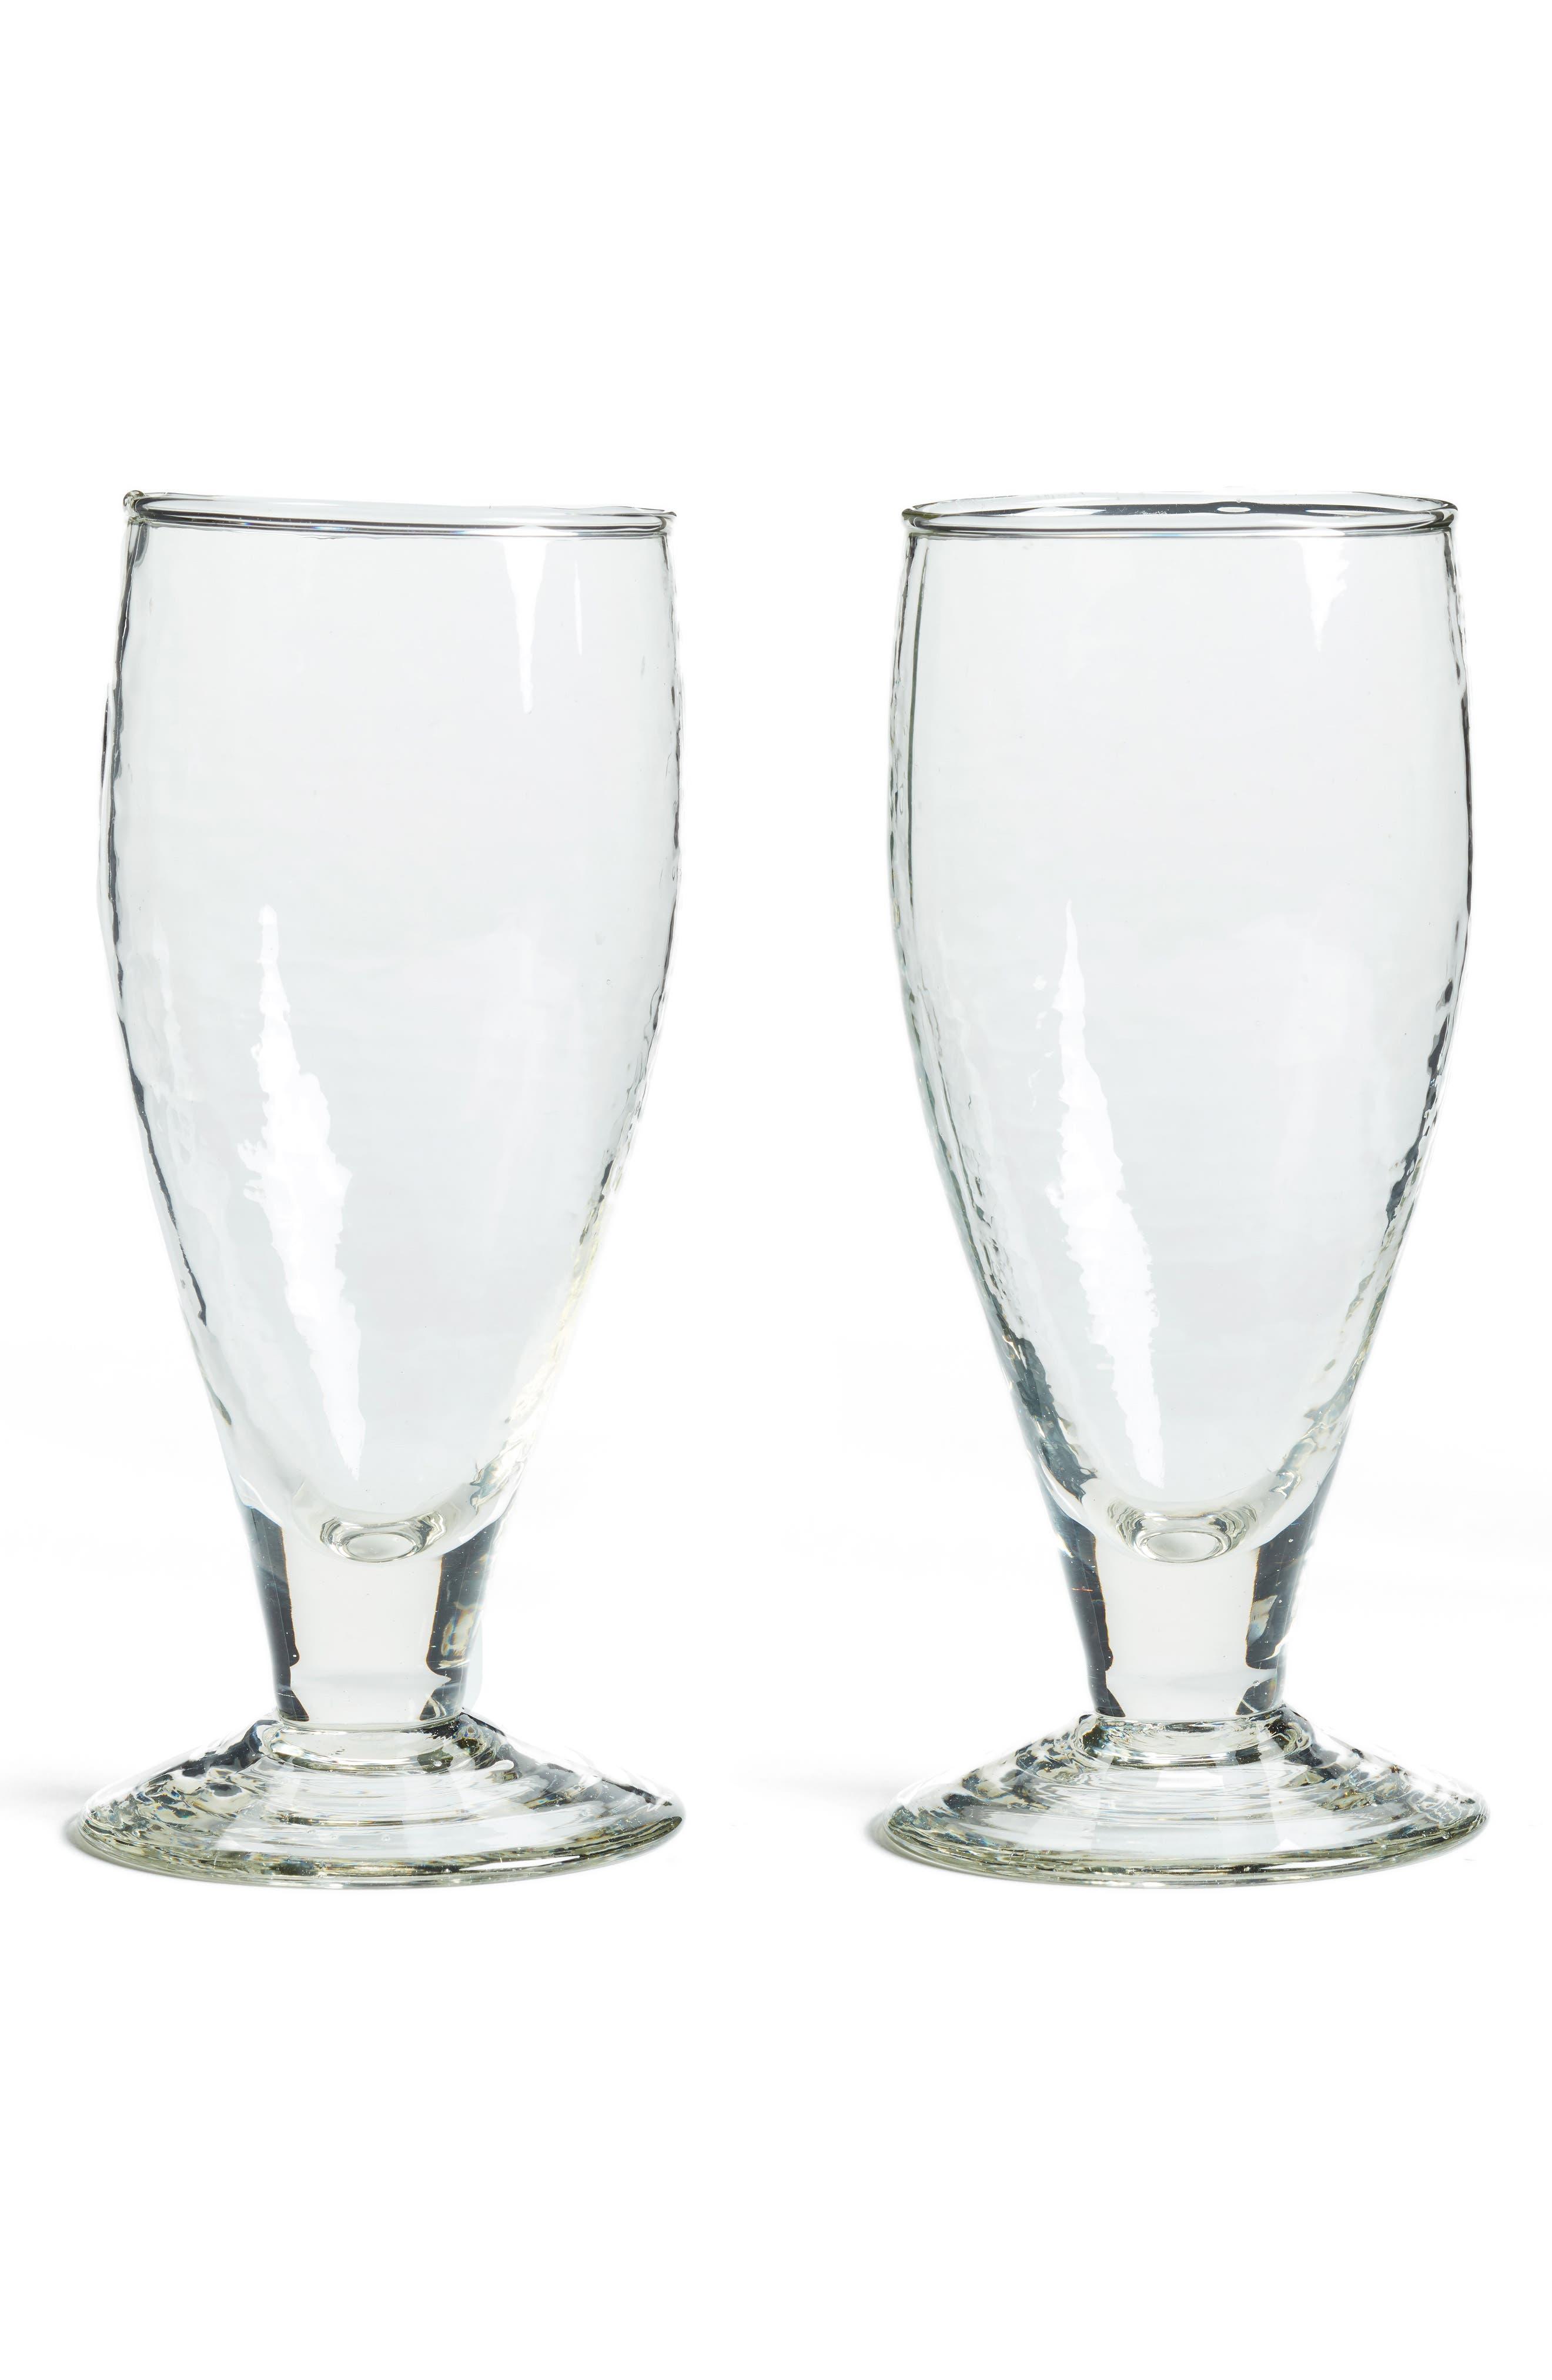 Set of 2 Hammered Goblets,                         Main,                         color, Clear